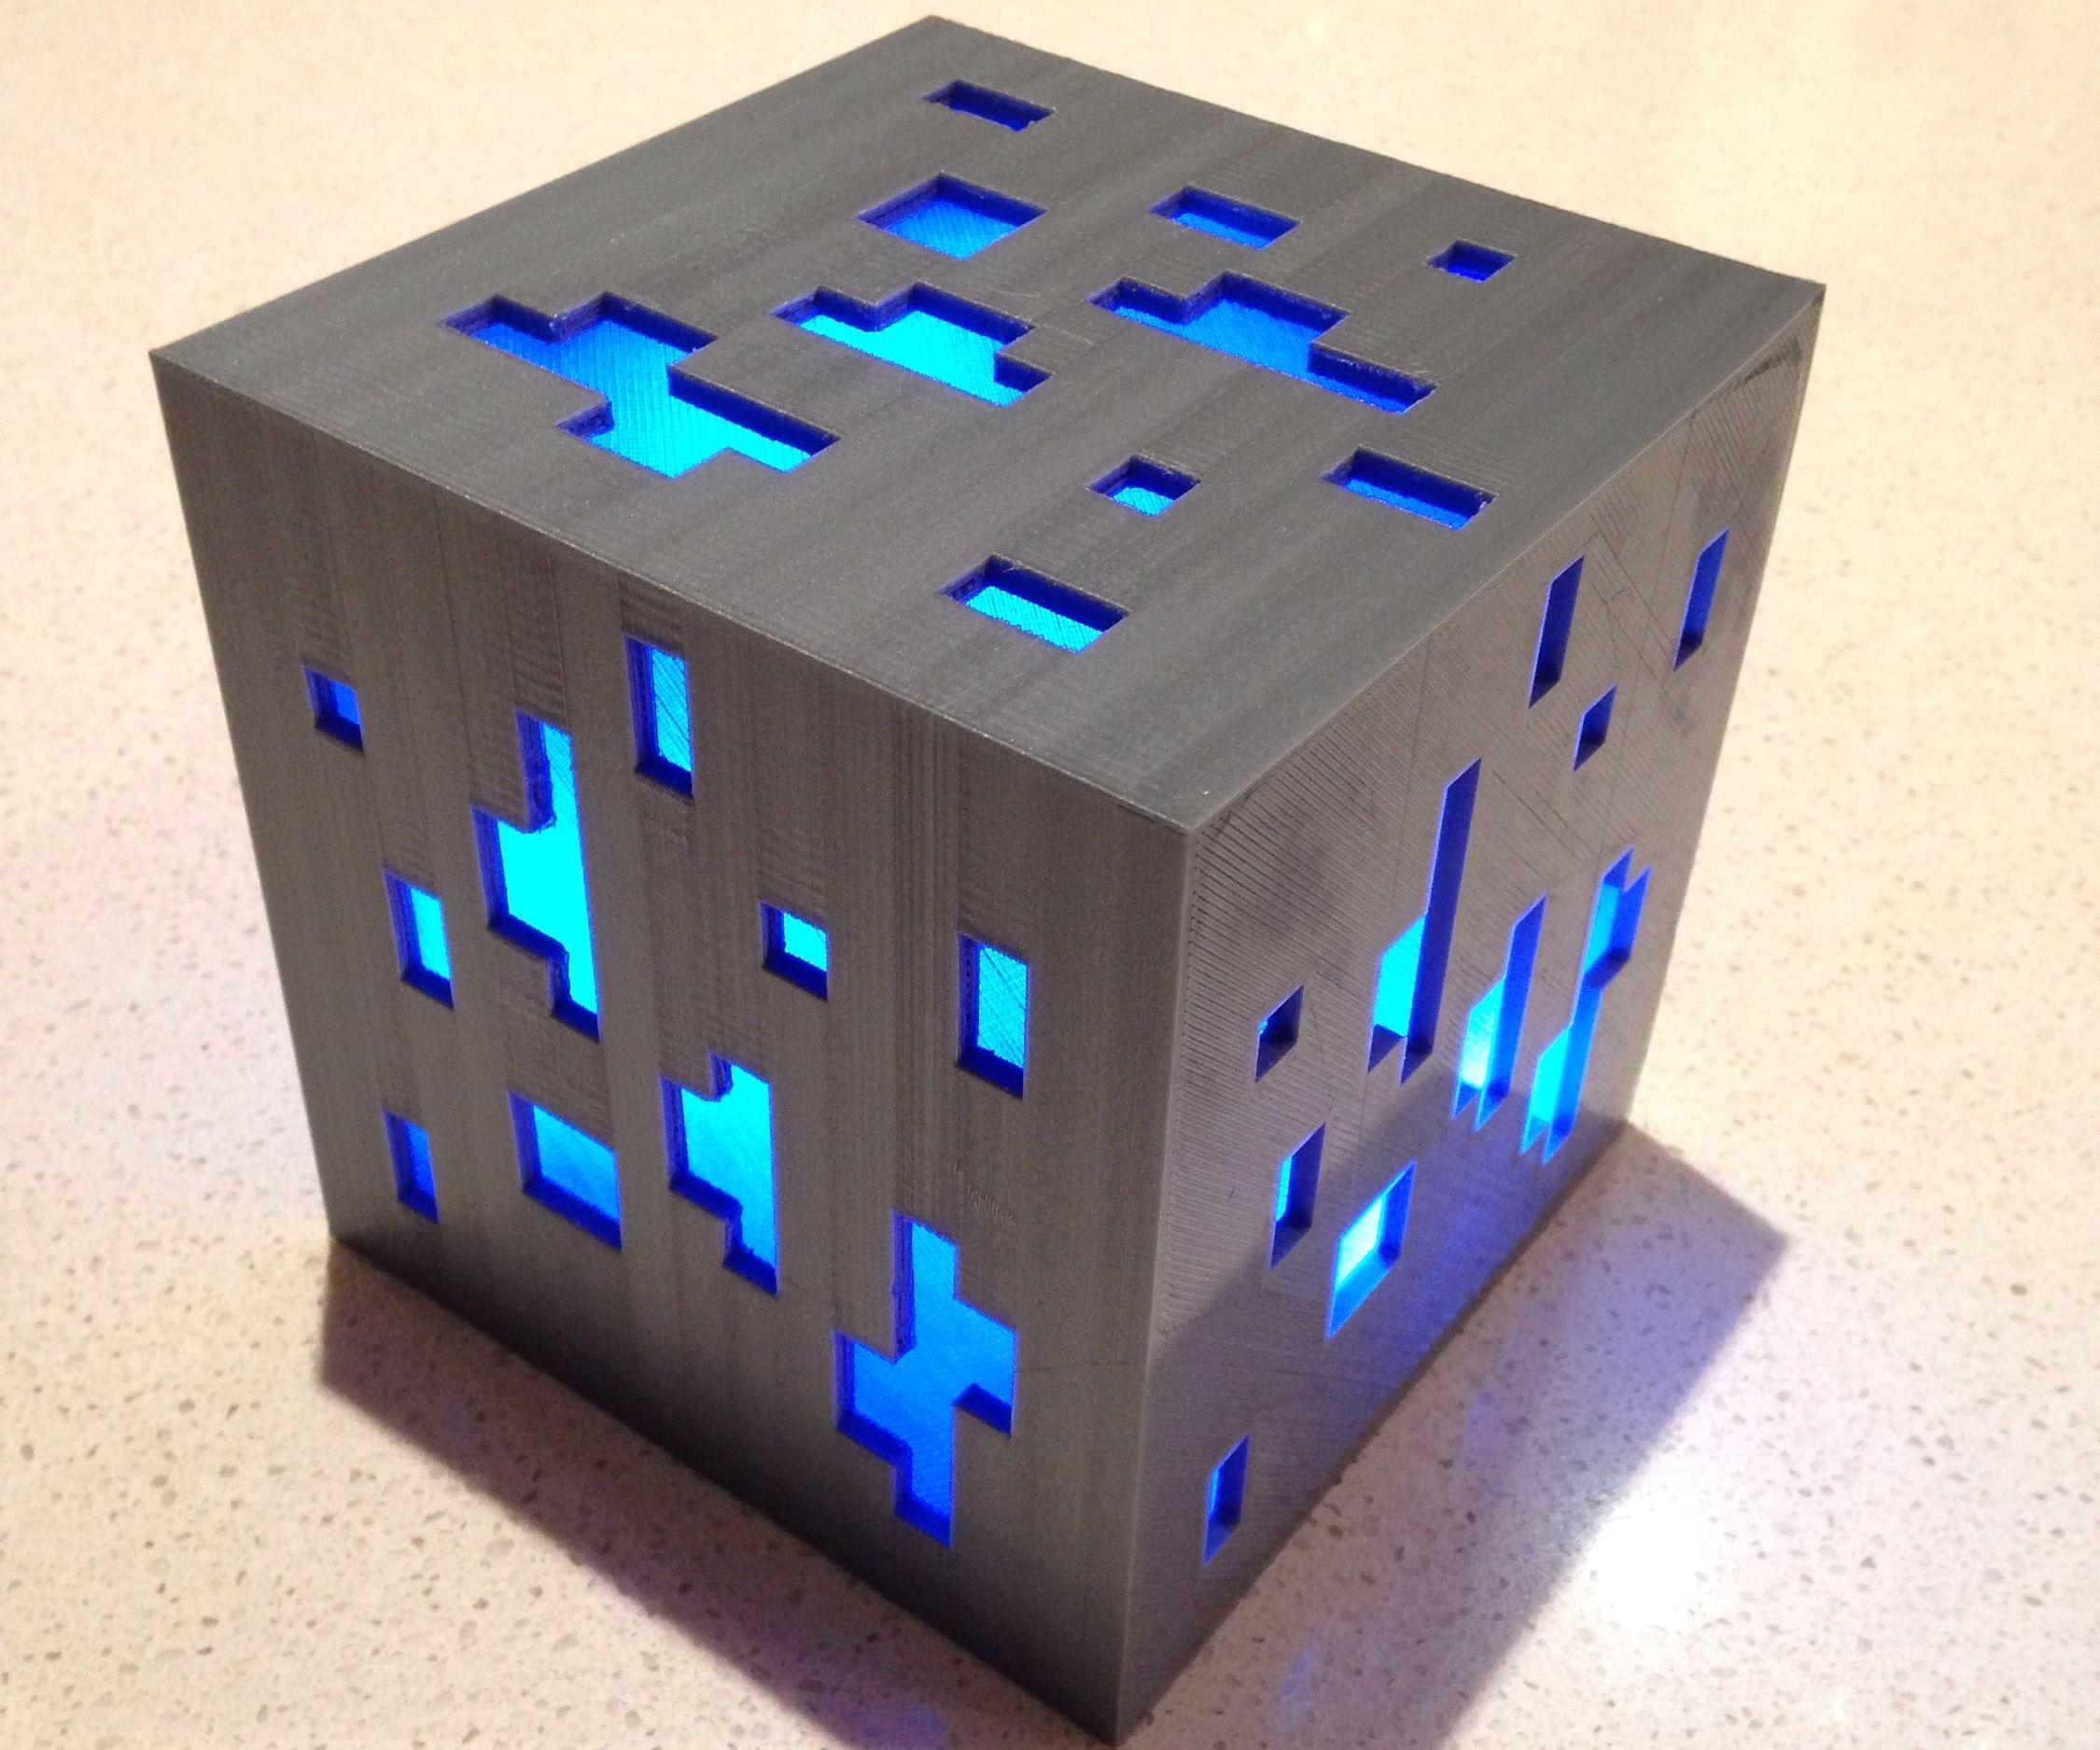 3D Printed Minecraft LED Ore Block